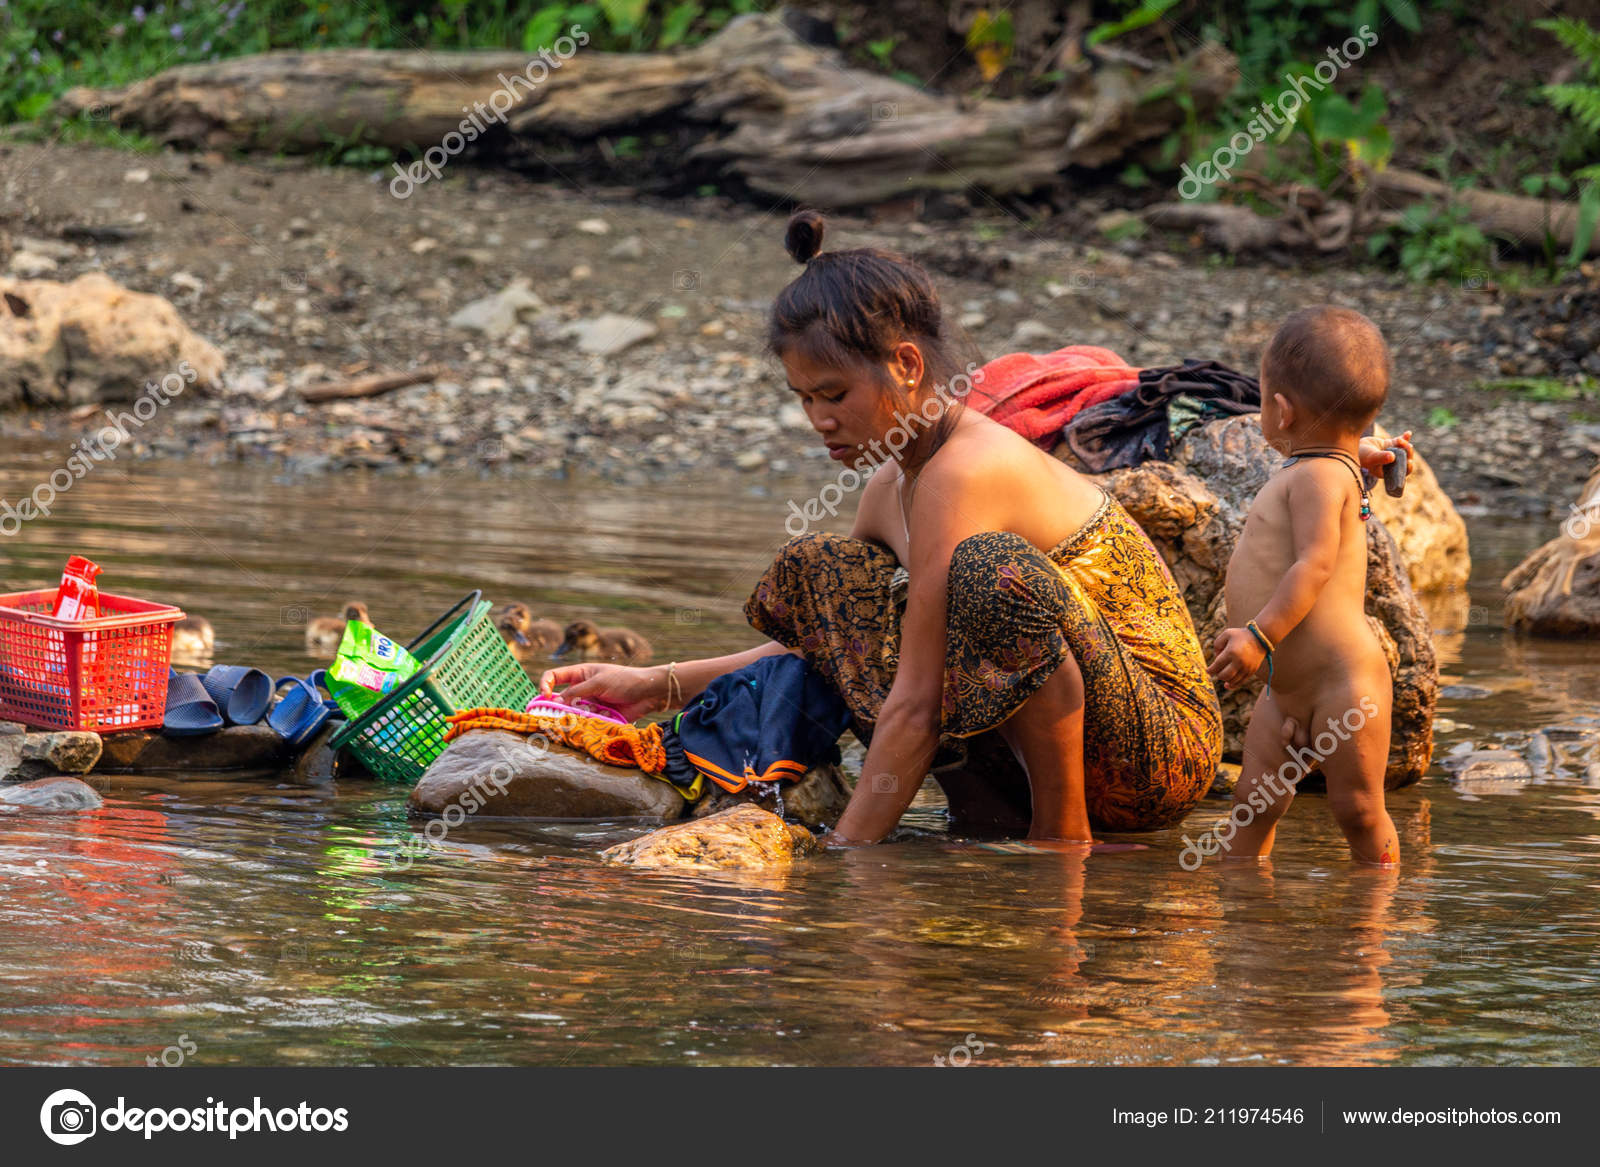 laos child girl bath Dreamstime.com